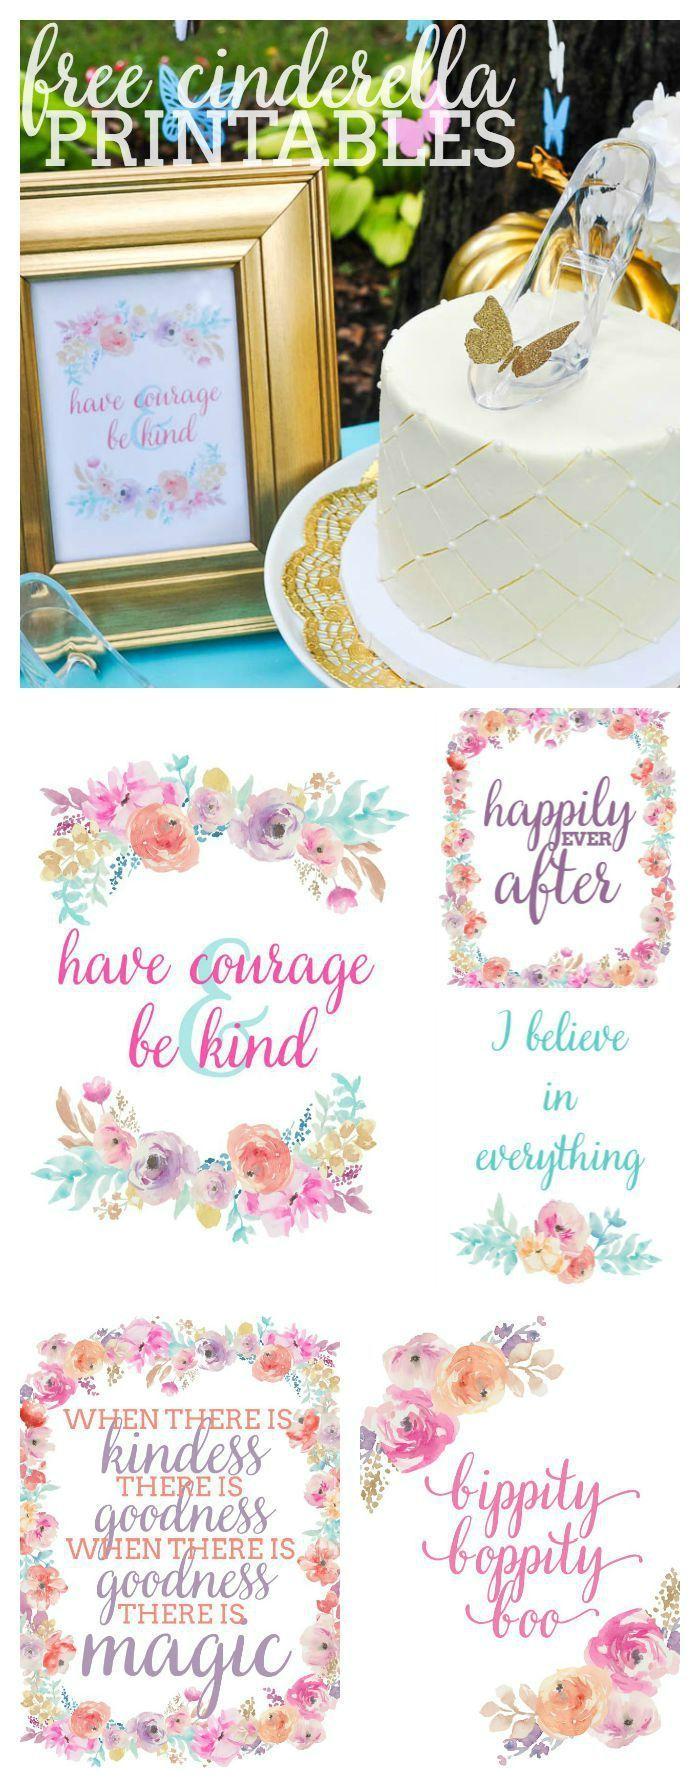 Bippity Boppity Boo – Free Cinderella Printables